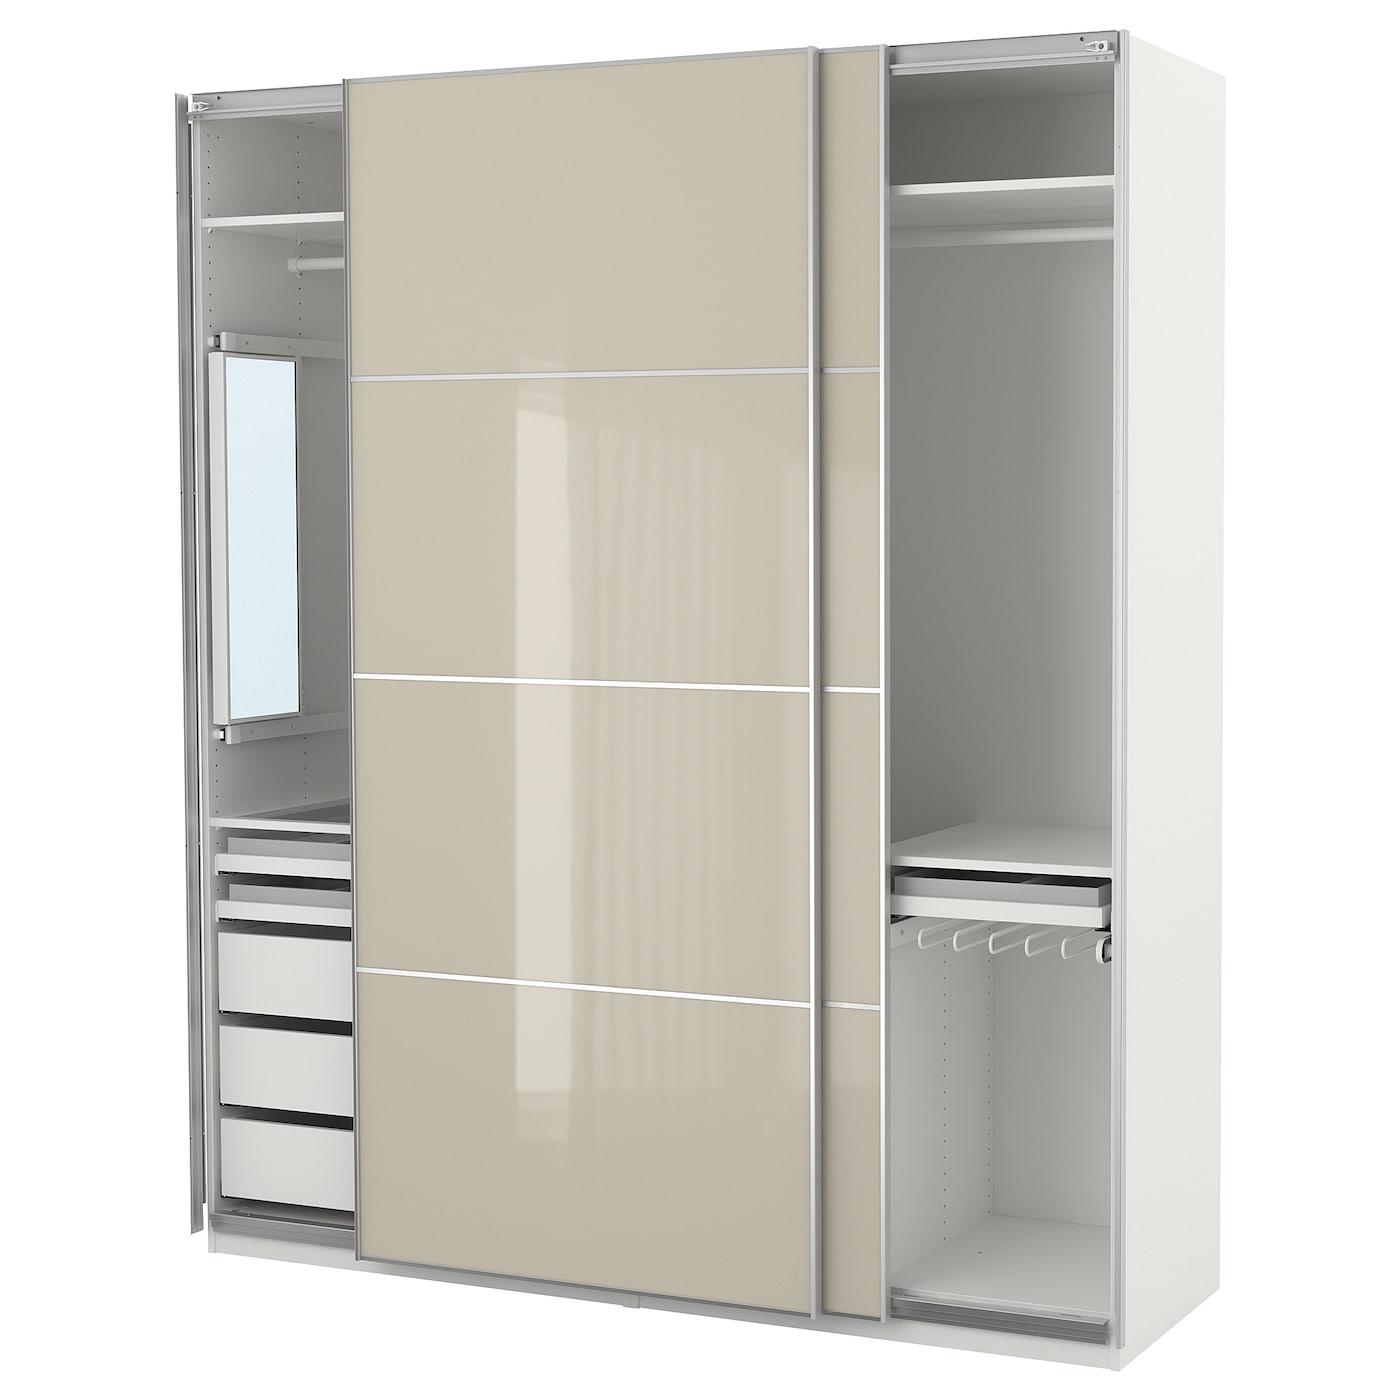 pax wardrobe white hokksund high gloss light beige 200 x 66 x 236 cm ikea. Black Bedroom Furniture Sets. Home Design Ideas